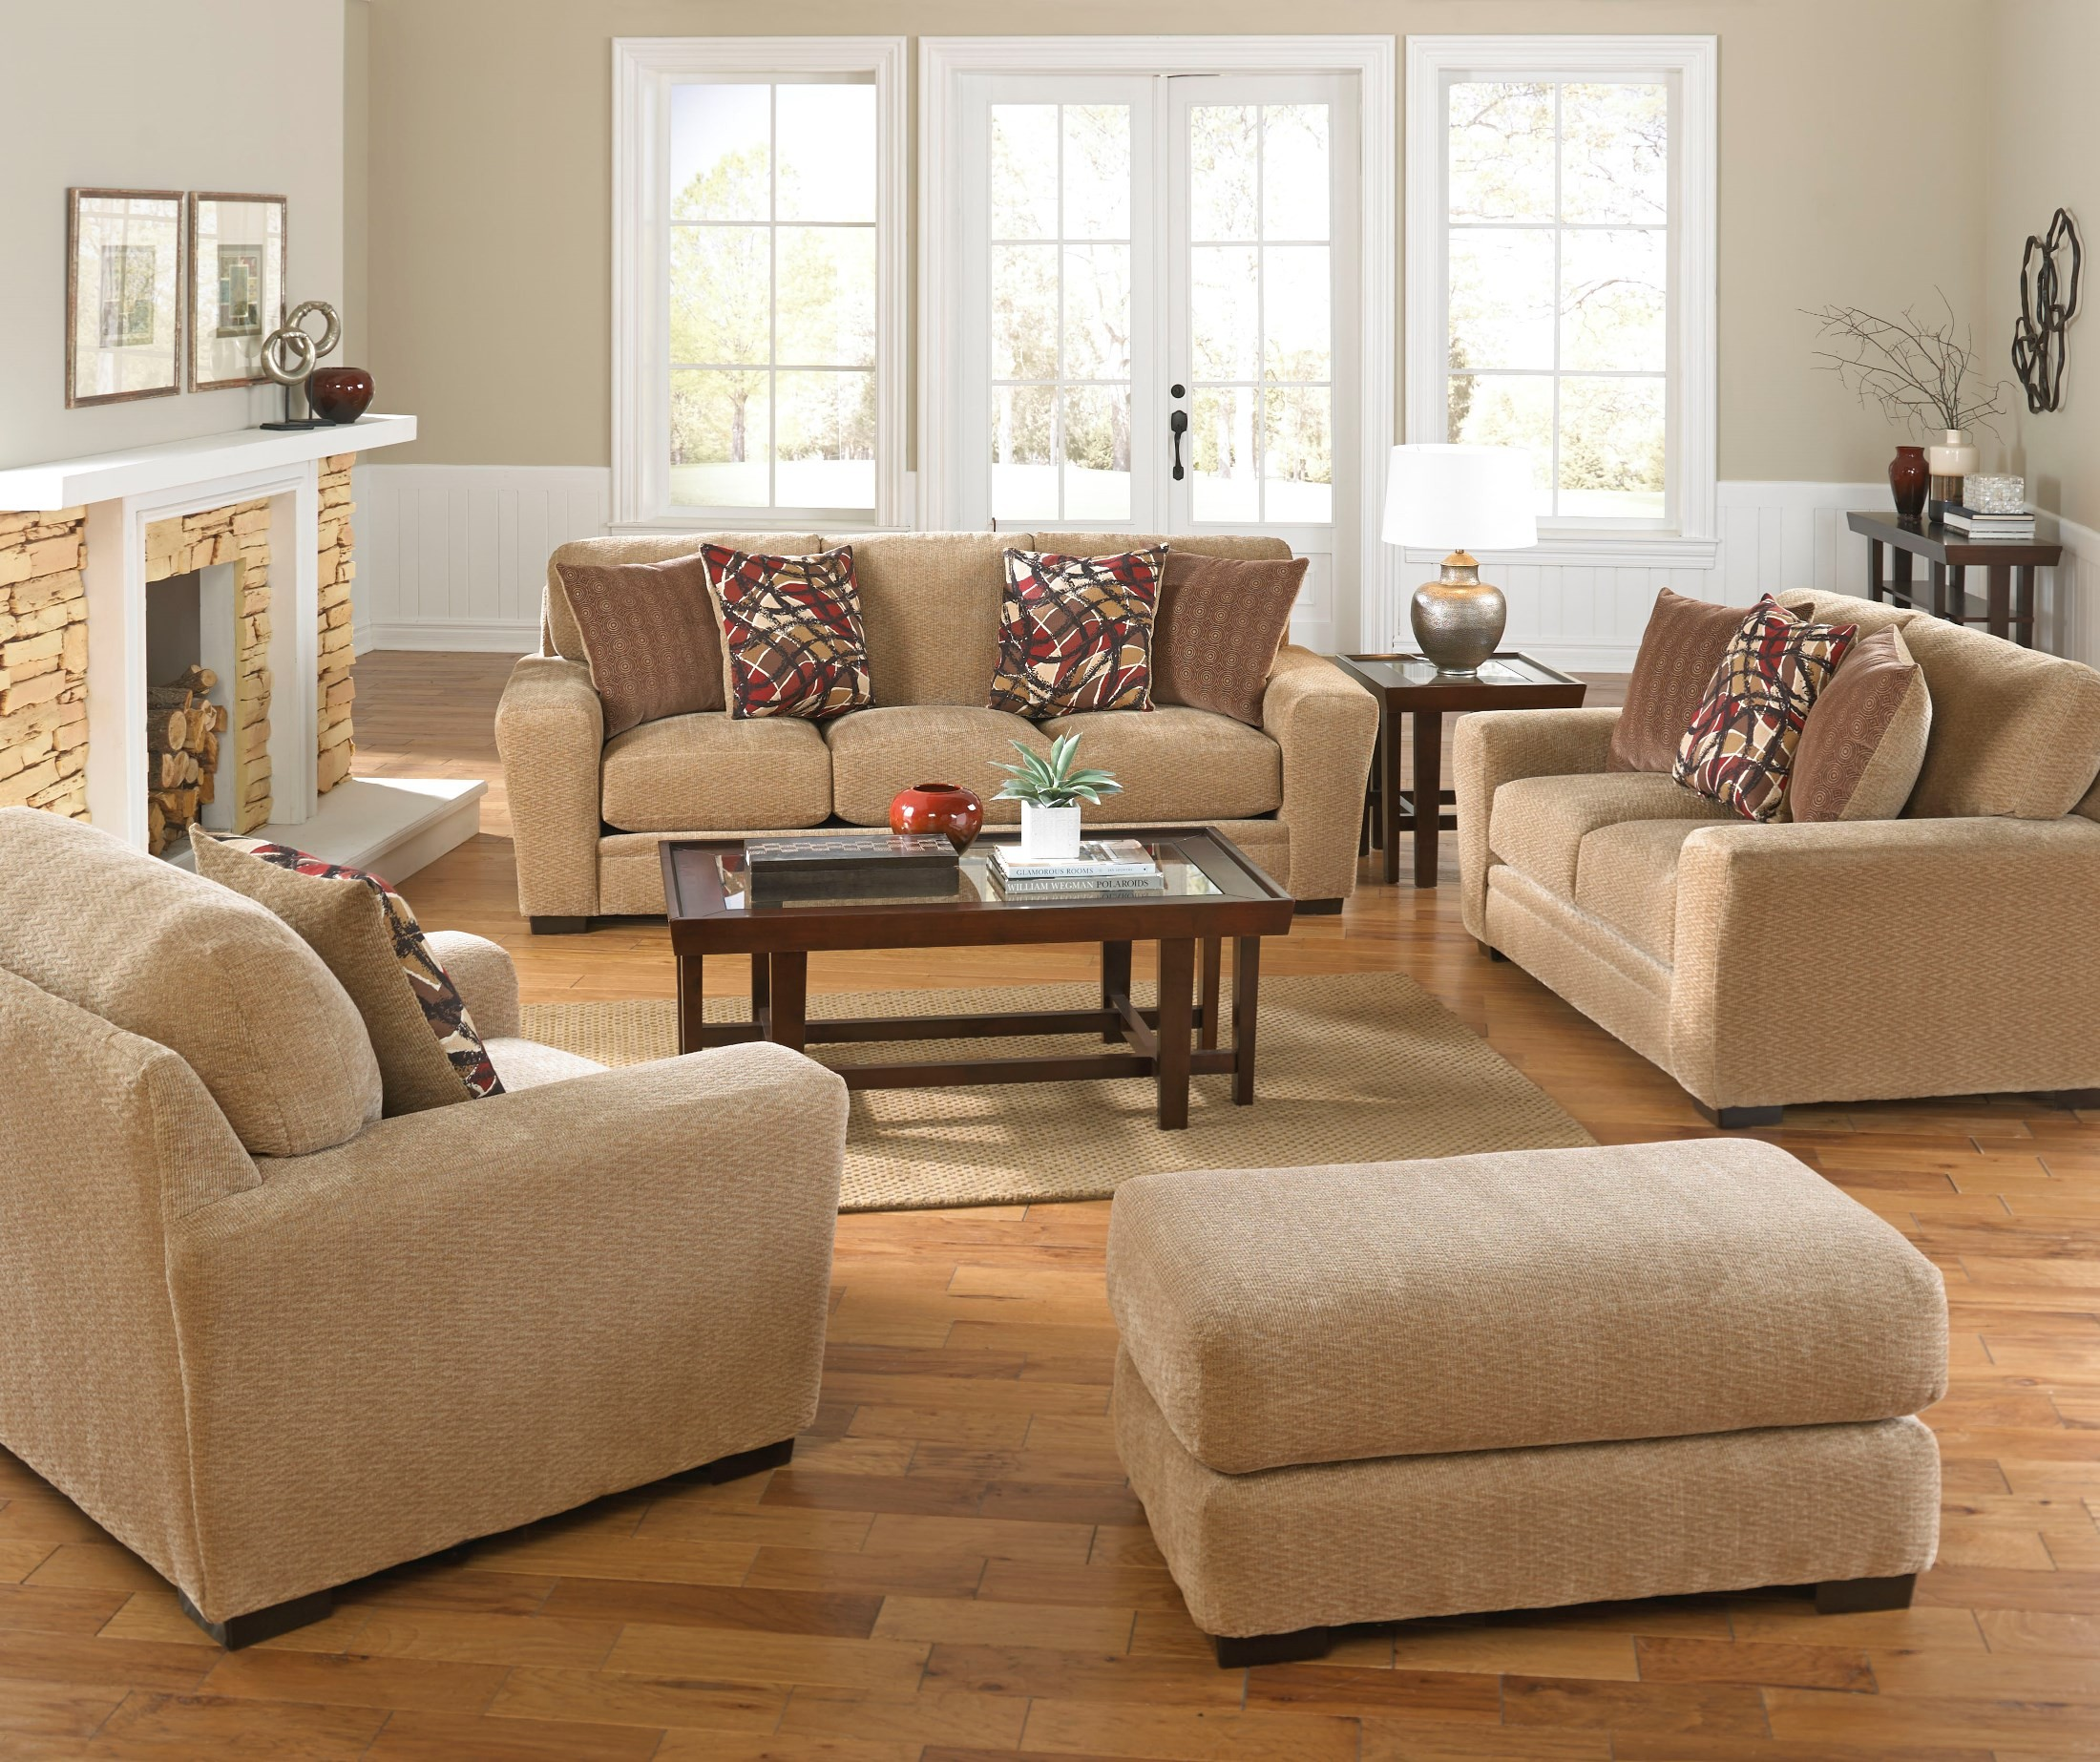 the brick living room sets